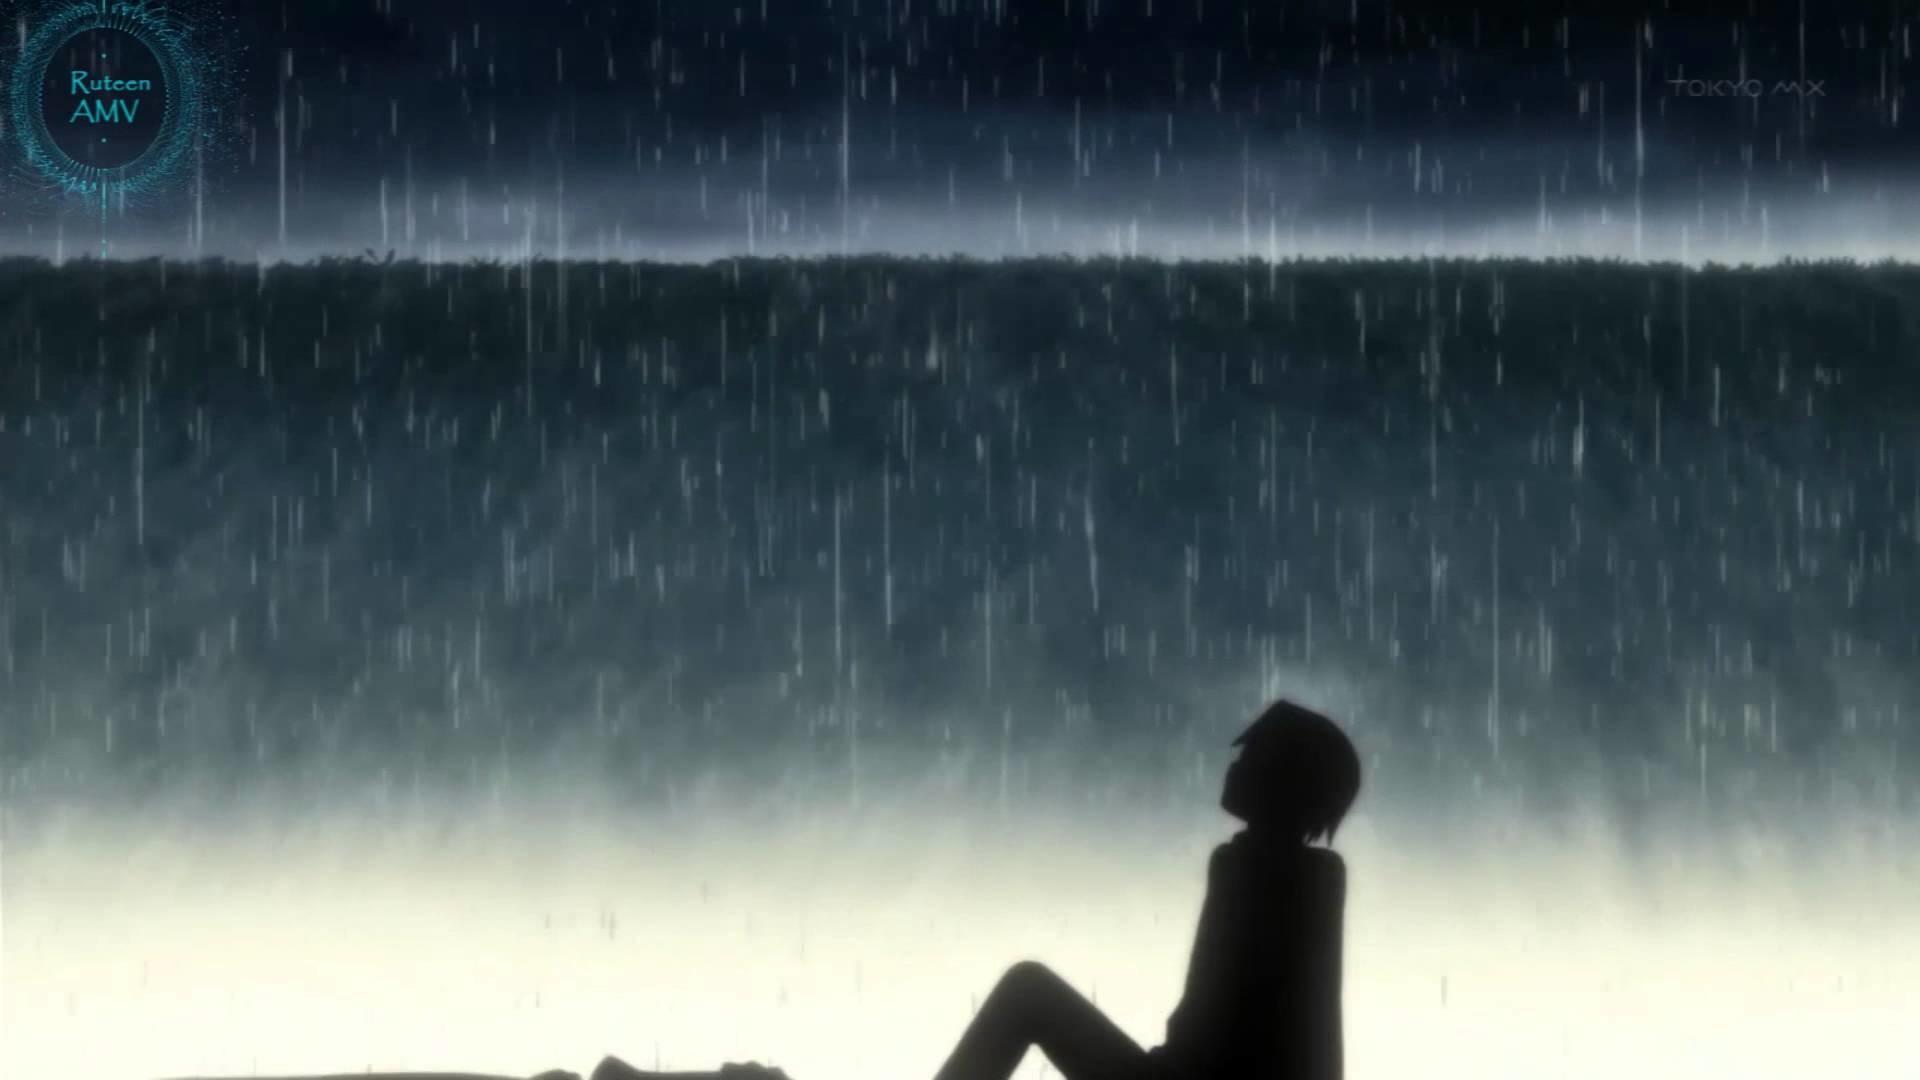 Res: 1920x1080, [AMV] Sad anime mix - It Ends Tonight - YouTube